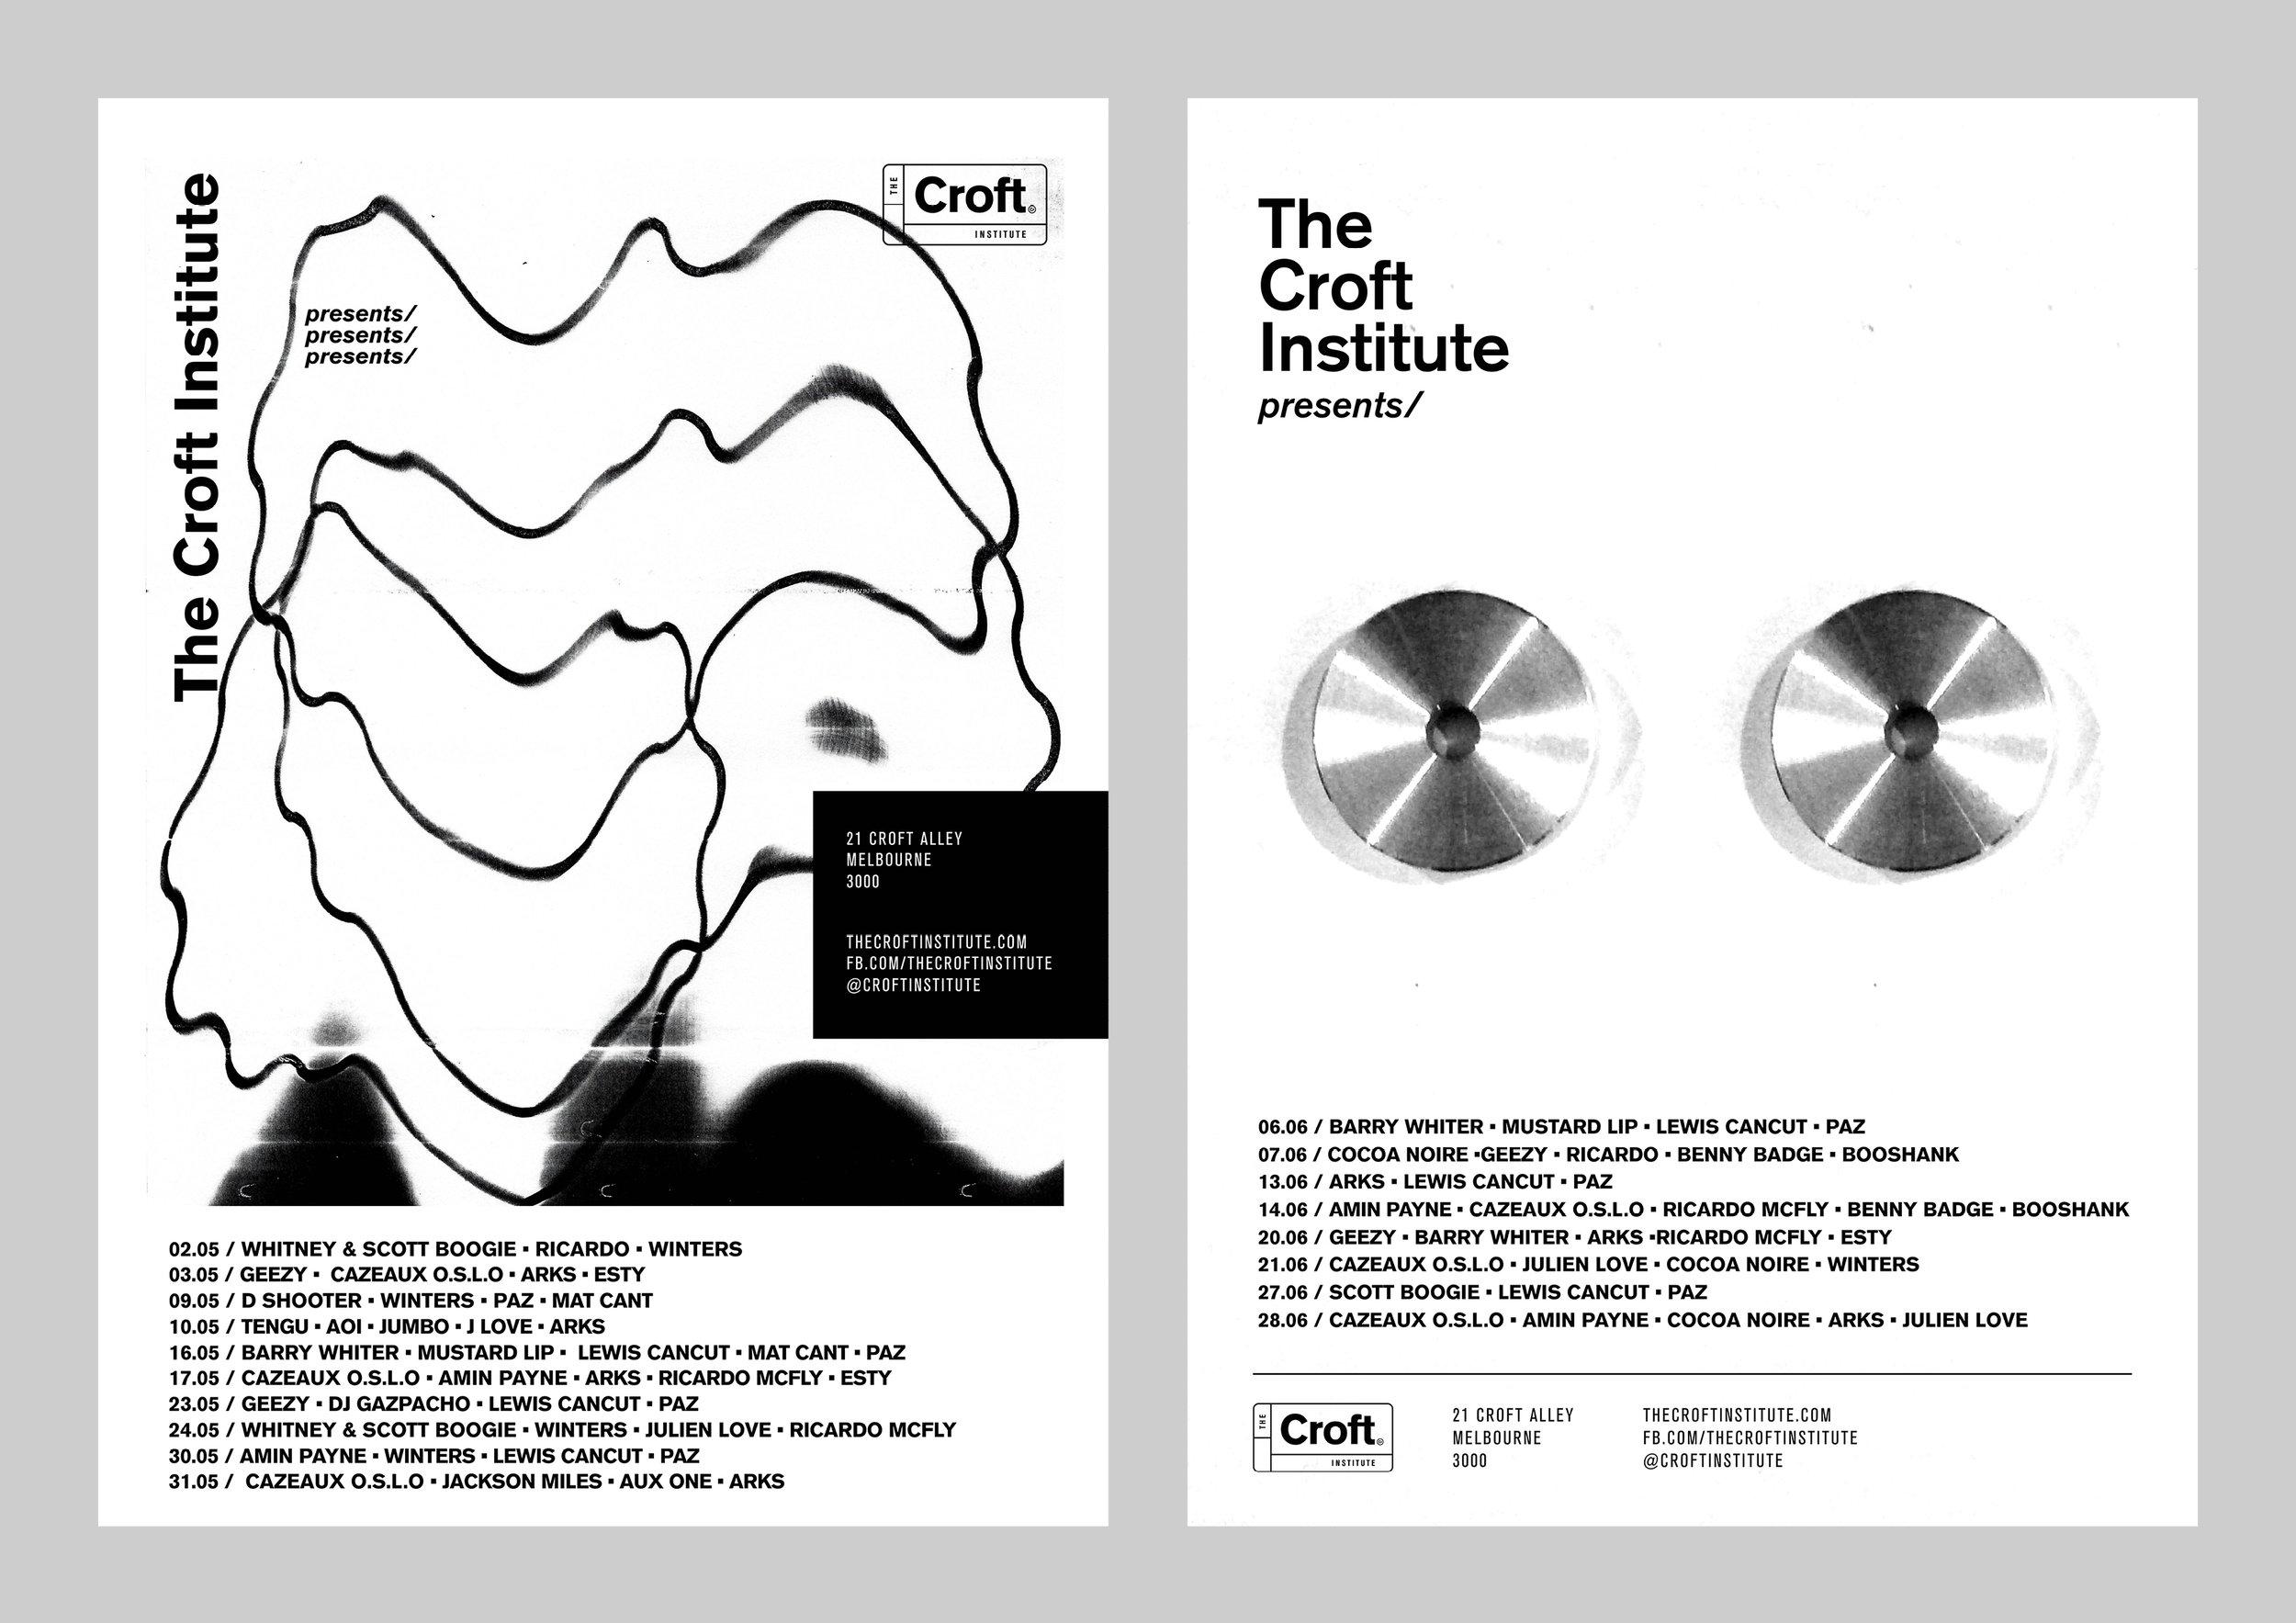 Croft4.jpg